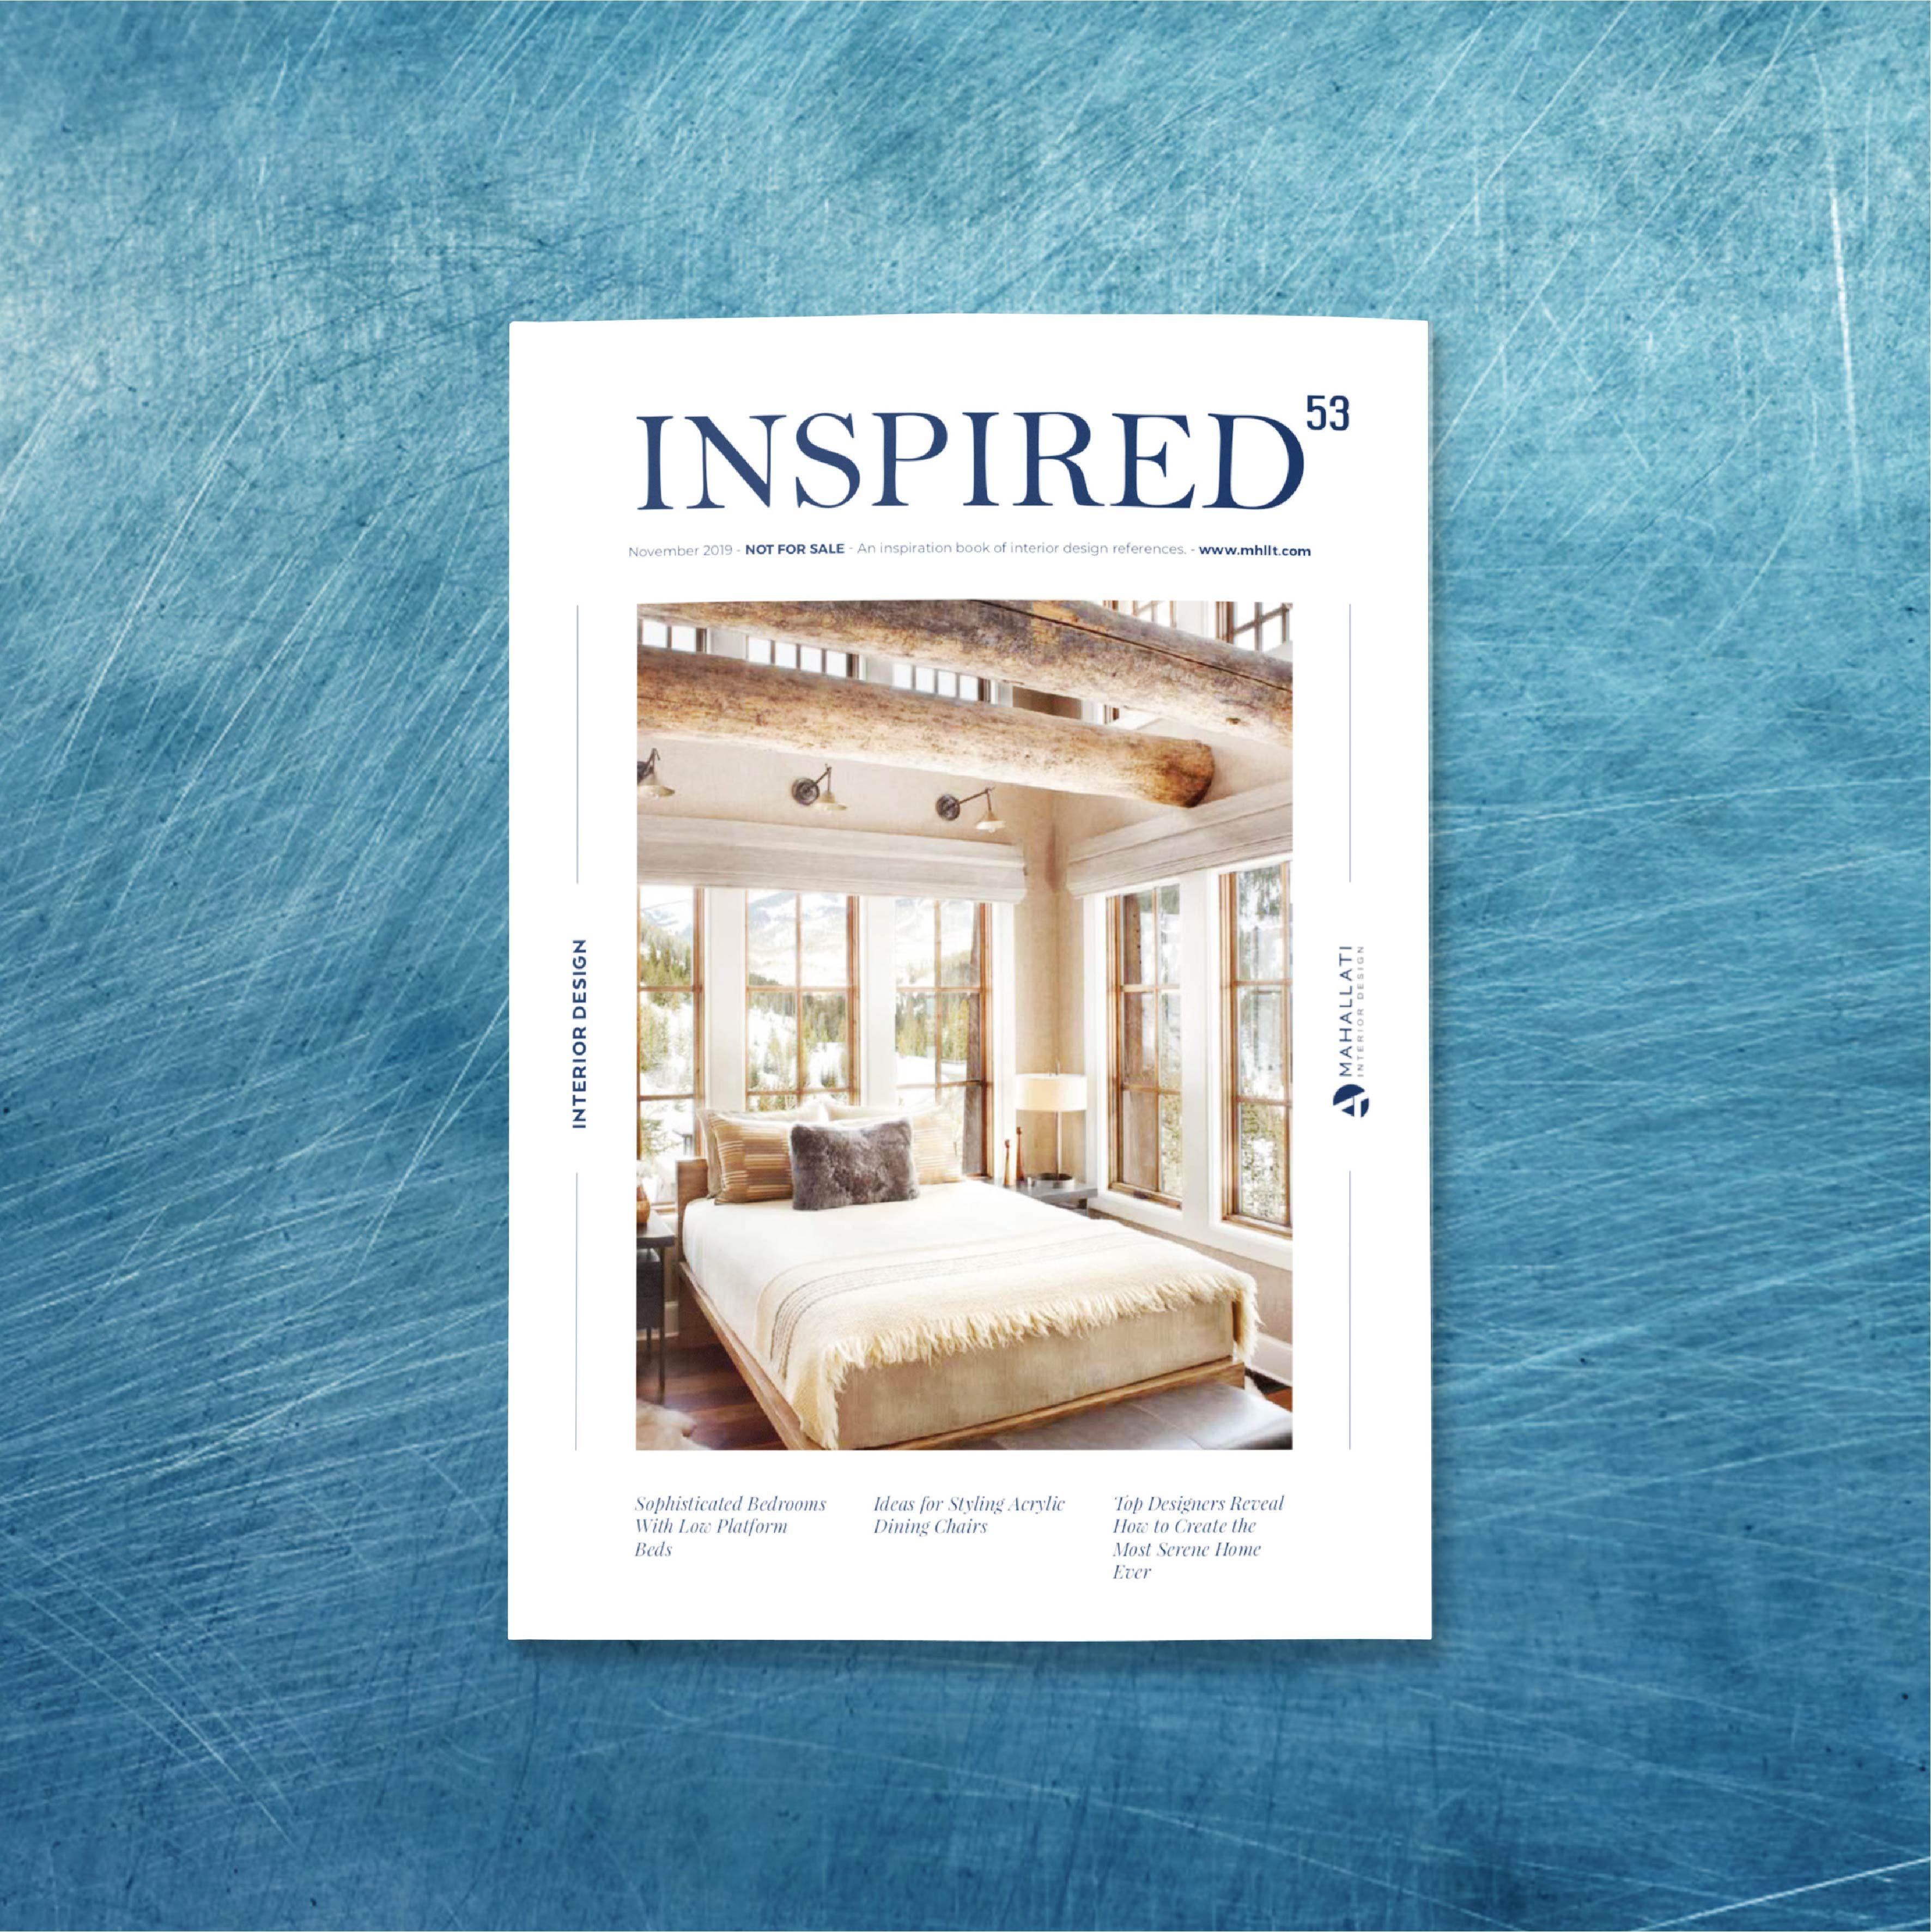 Inspired Magazine Vol 53 November 2019 Free Download